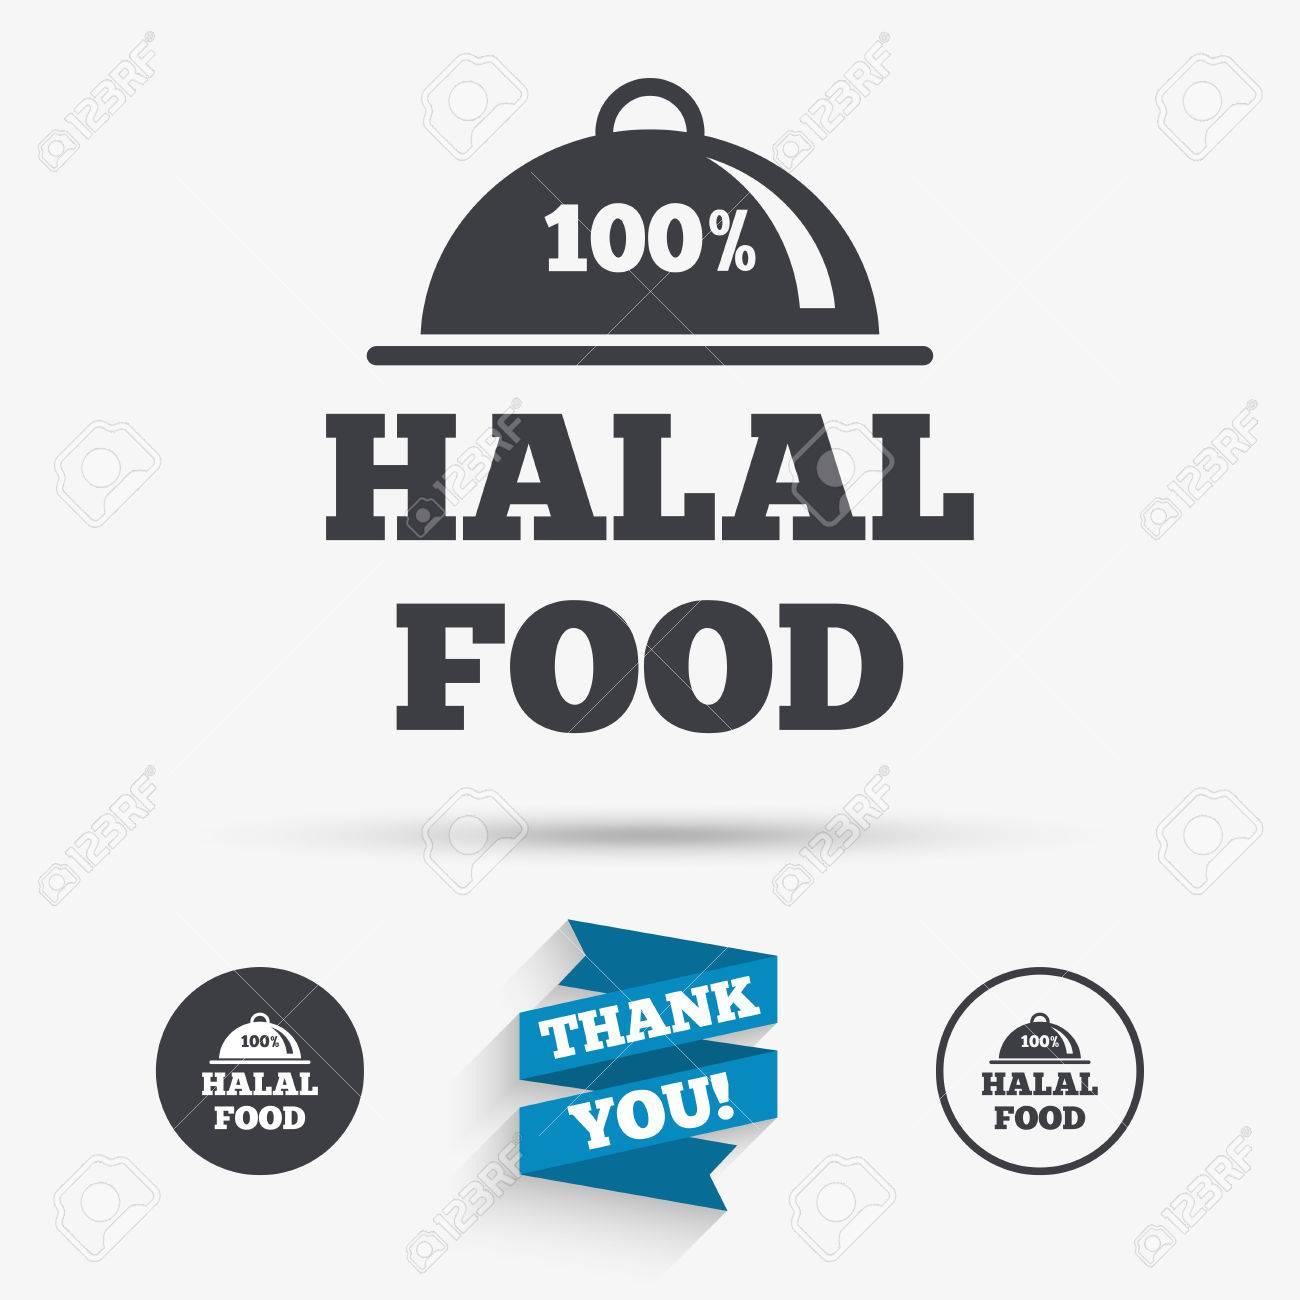 100 halal food product sign icon natural muslims food symbol 100 halal food product sign icon natural muslims food symbol flat icons buycottarizona